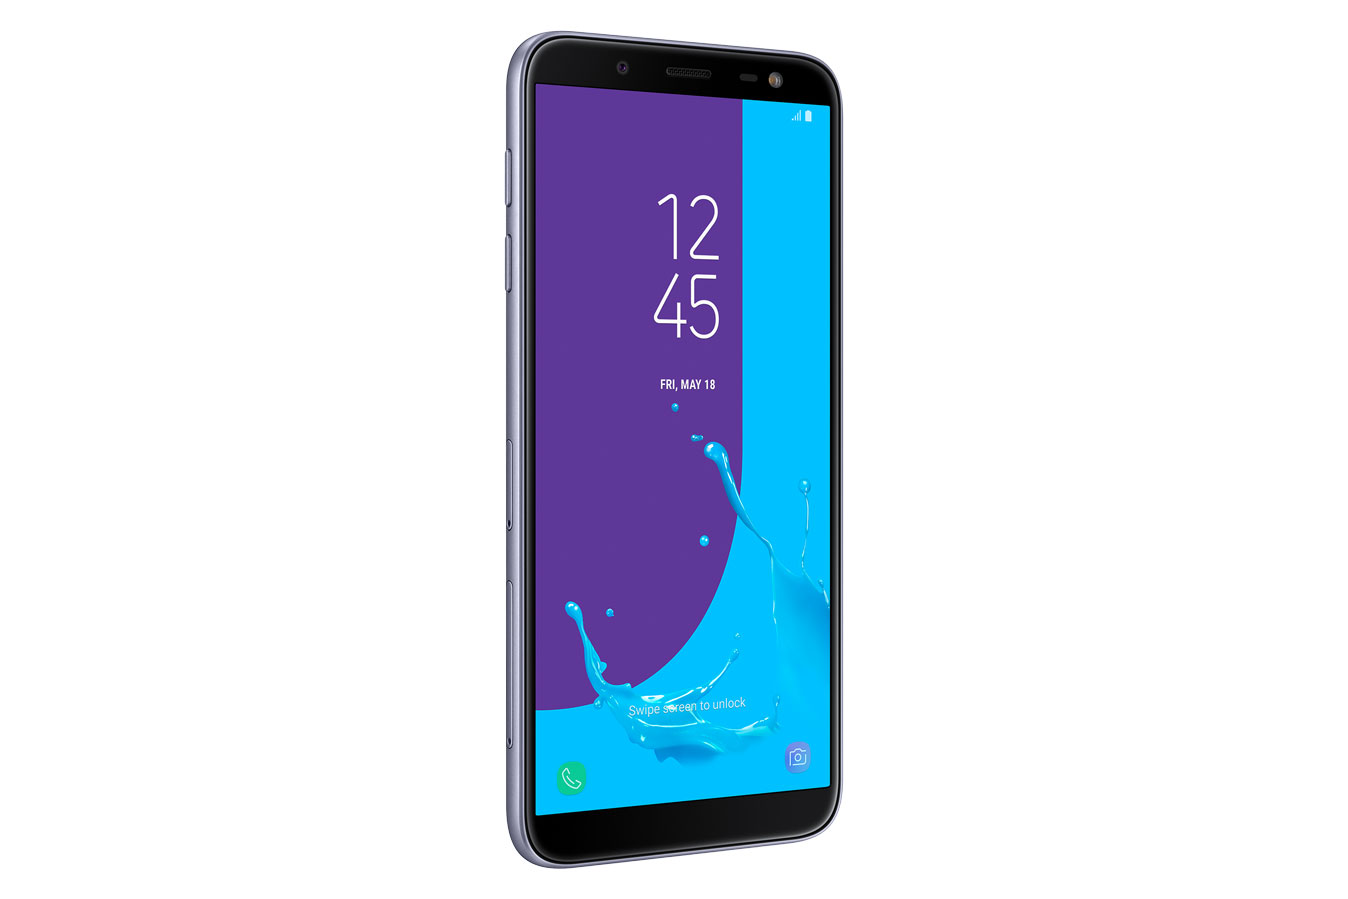 Samsung Galaxy J4 иJ6 поступают впродажу вРоссии